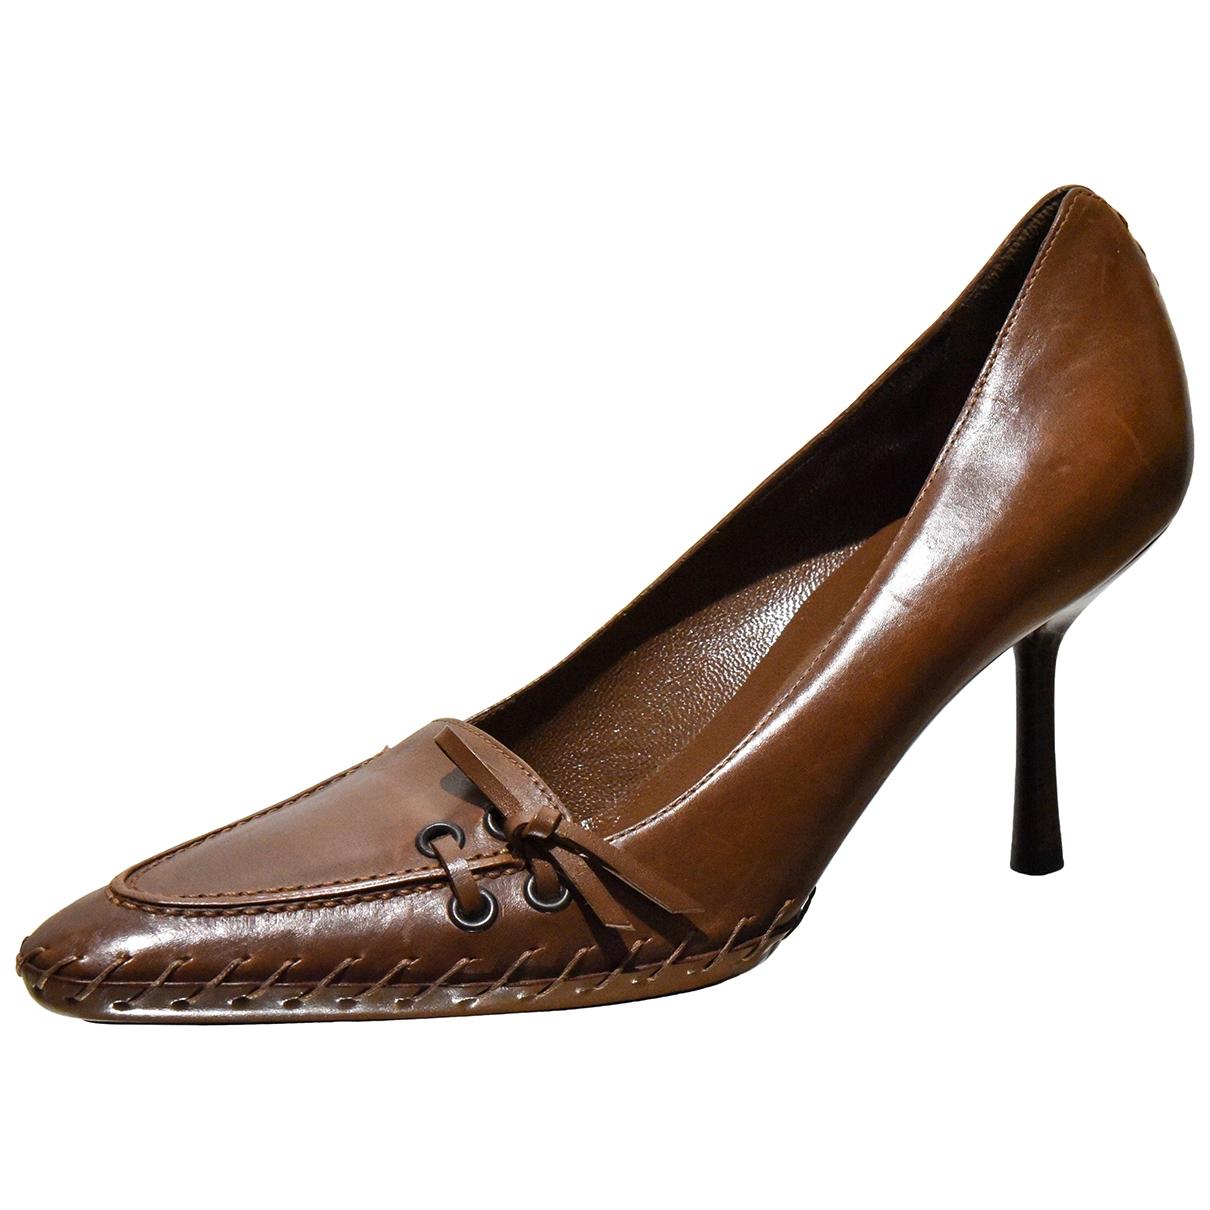 Gucci \N Camel Leather Heels for Women 38.5 EU